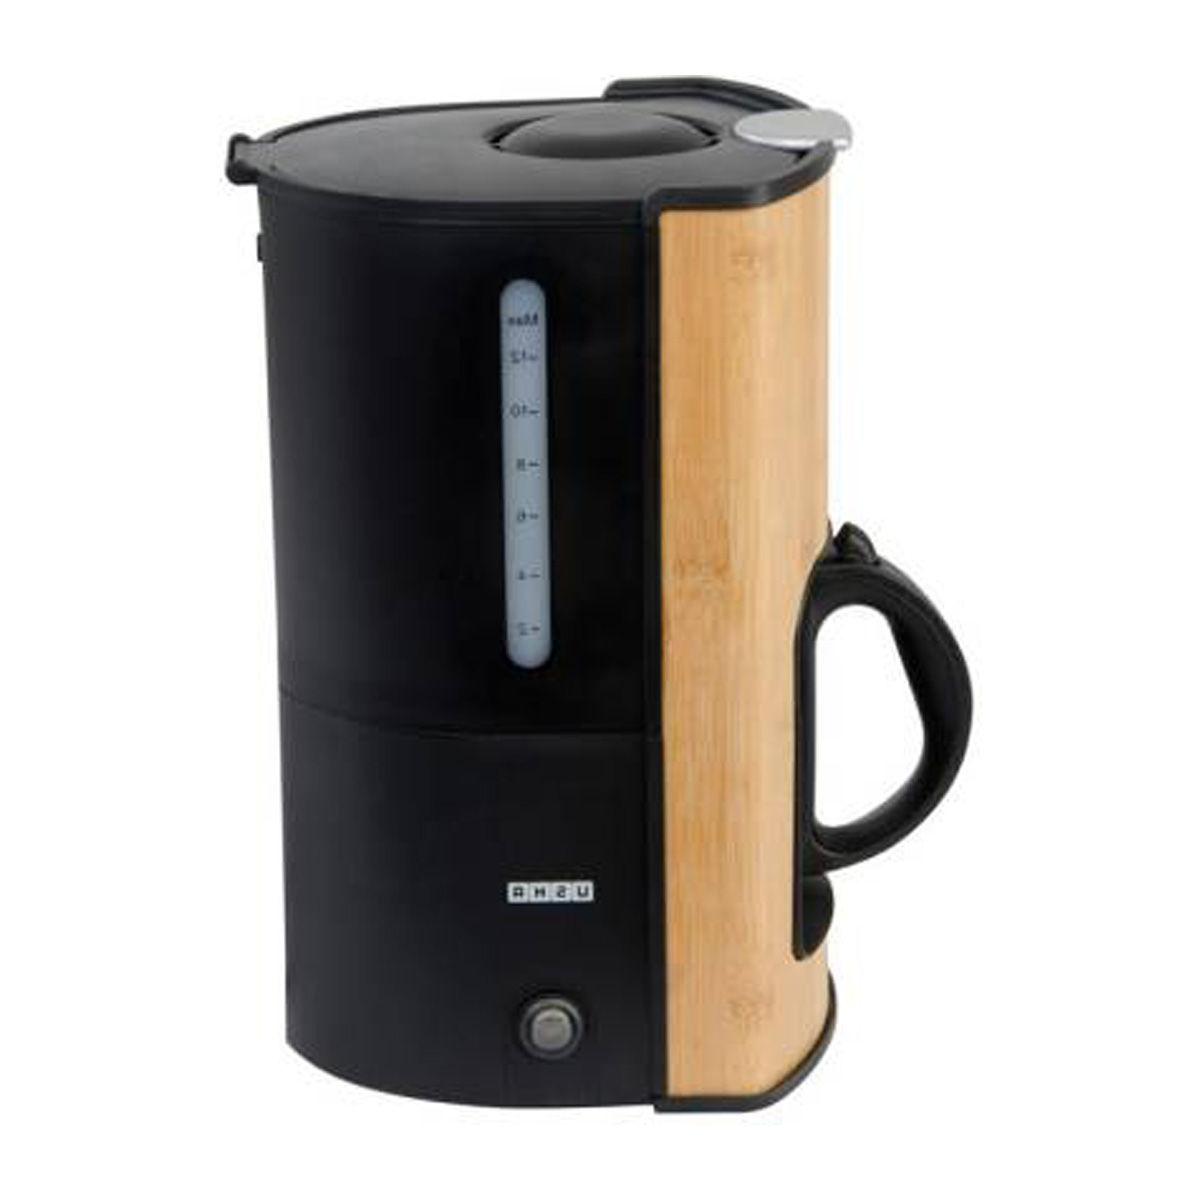 Usha CM 3215B 12 Cups Coffee Maker